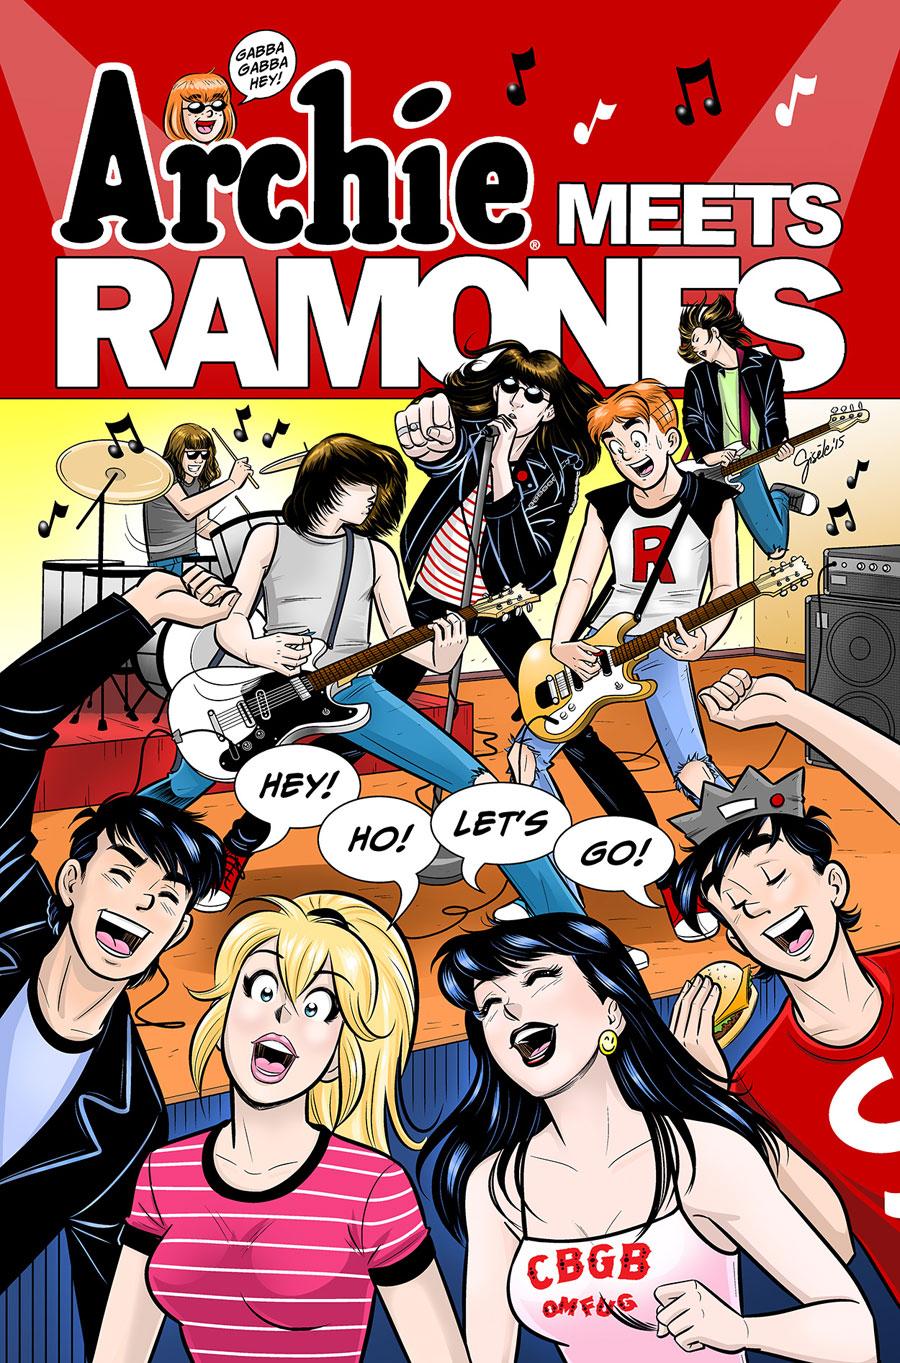 Archie meets Ramones - SDCC